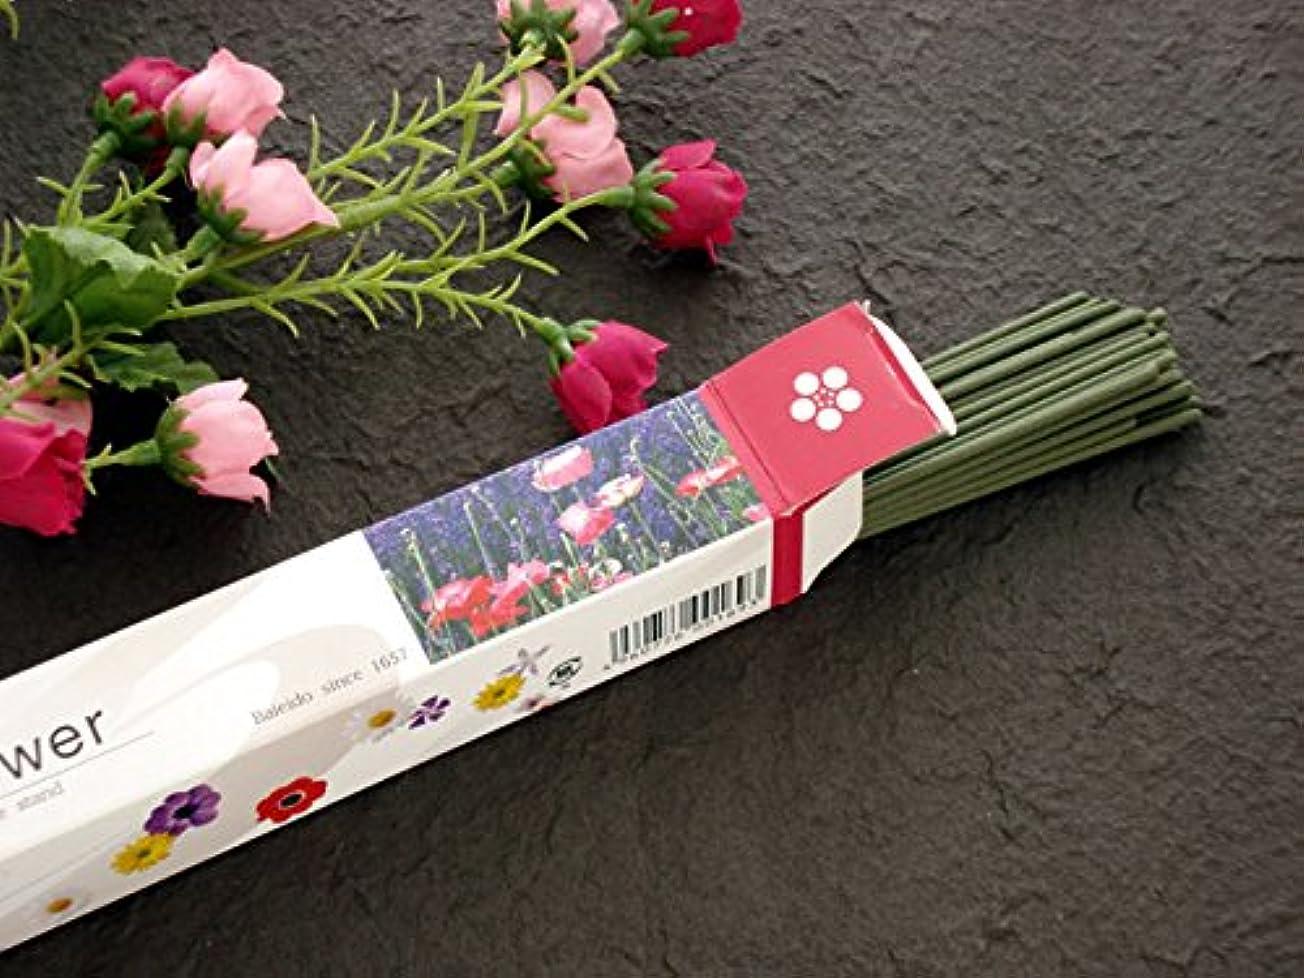 請求可能高齢者病的梅栄堂のお香 Wild flower